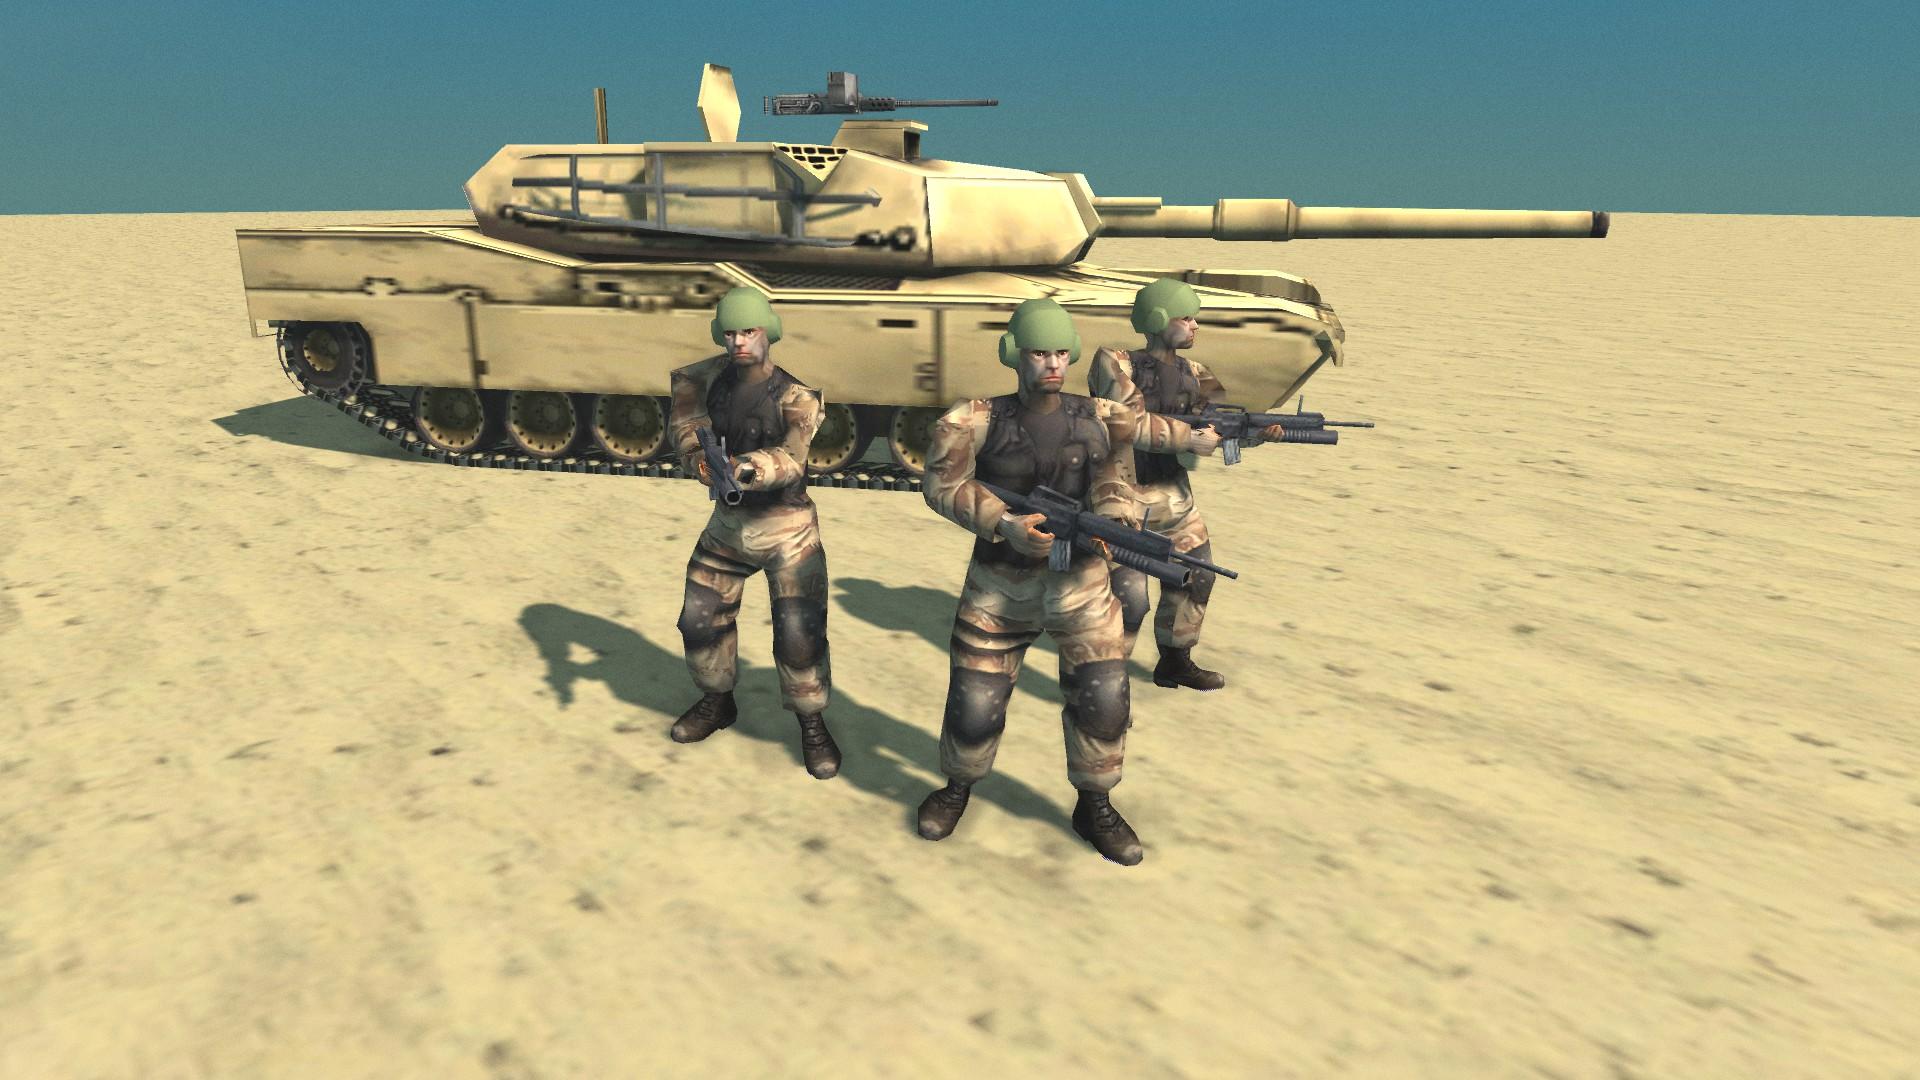 USA tankmen image - Conflict: Desert Storm II Remastered mod